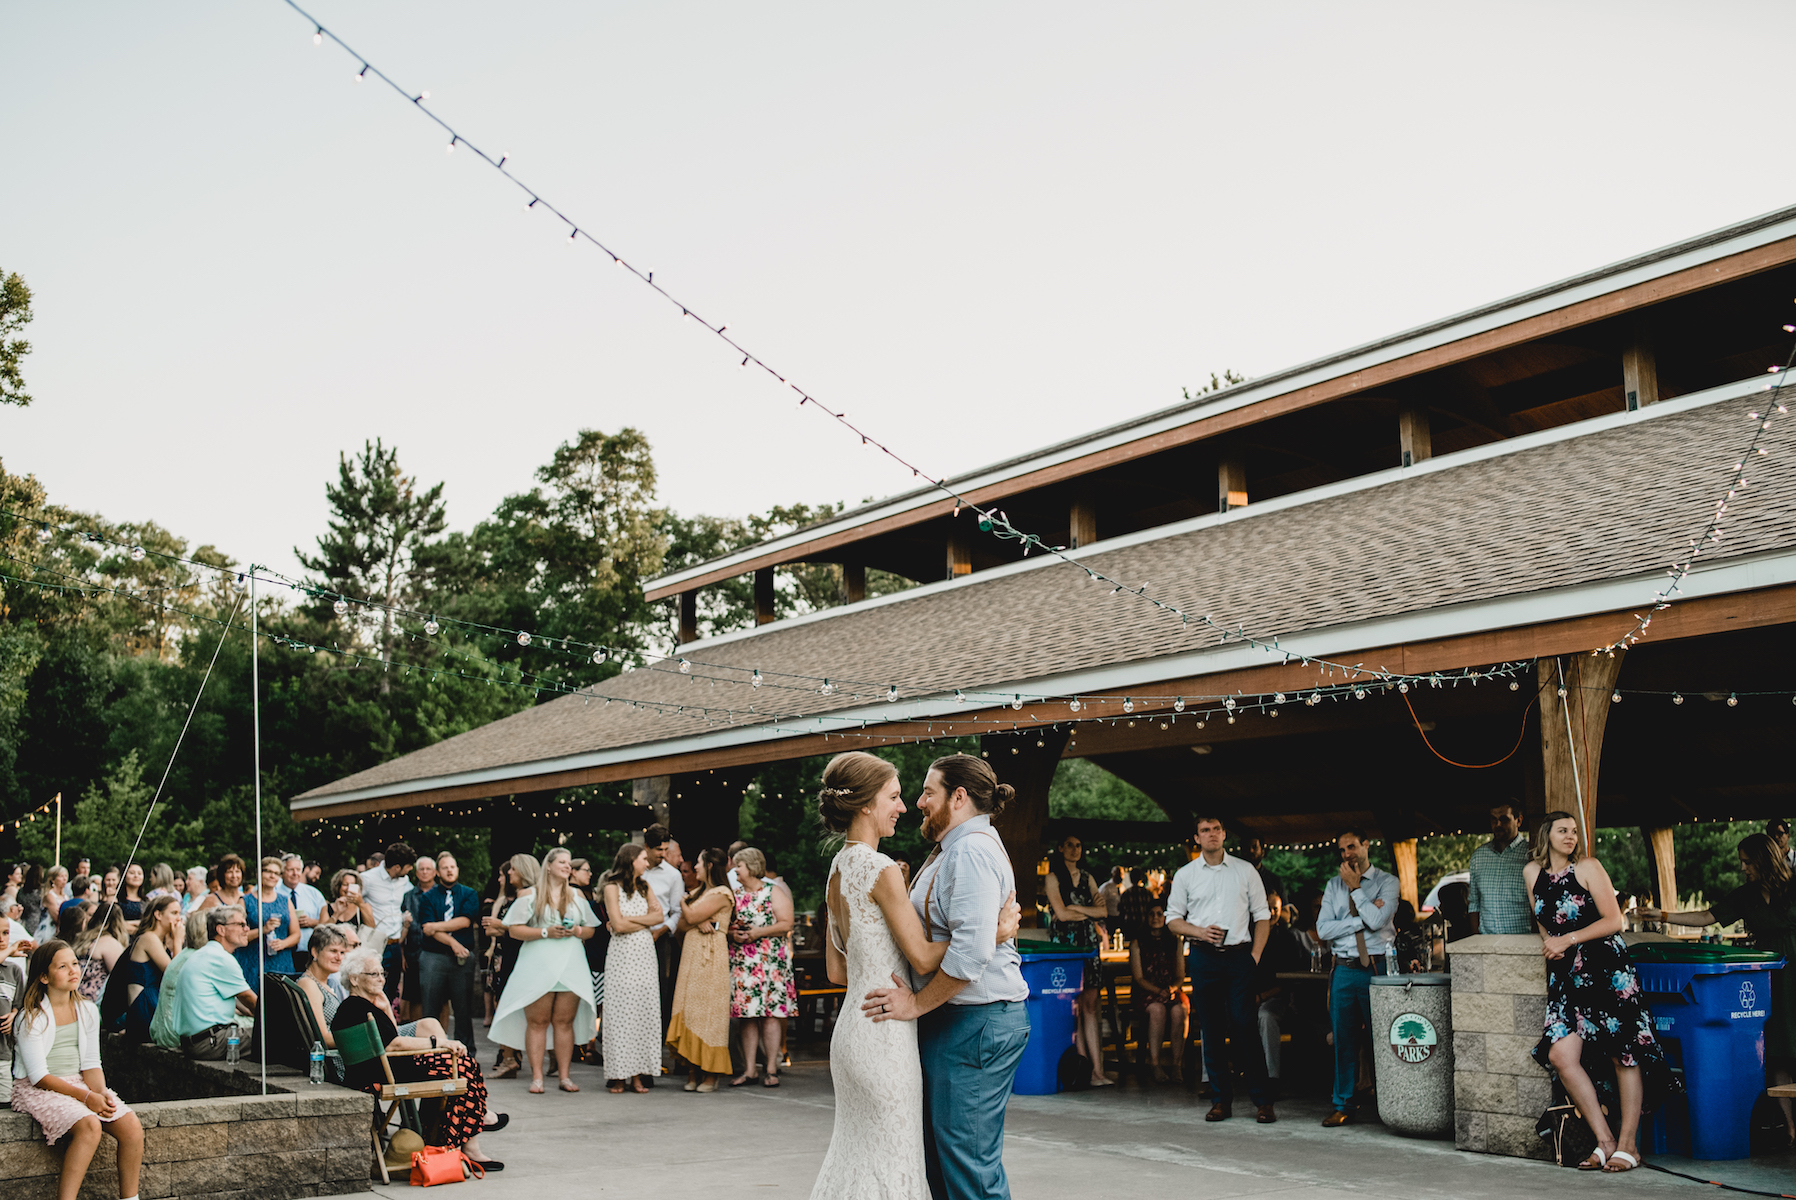 engle-olson-emily-skyler-mn-wedding-47.jpg